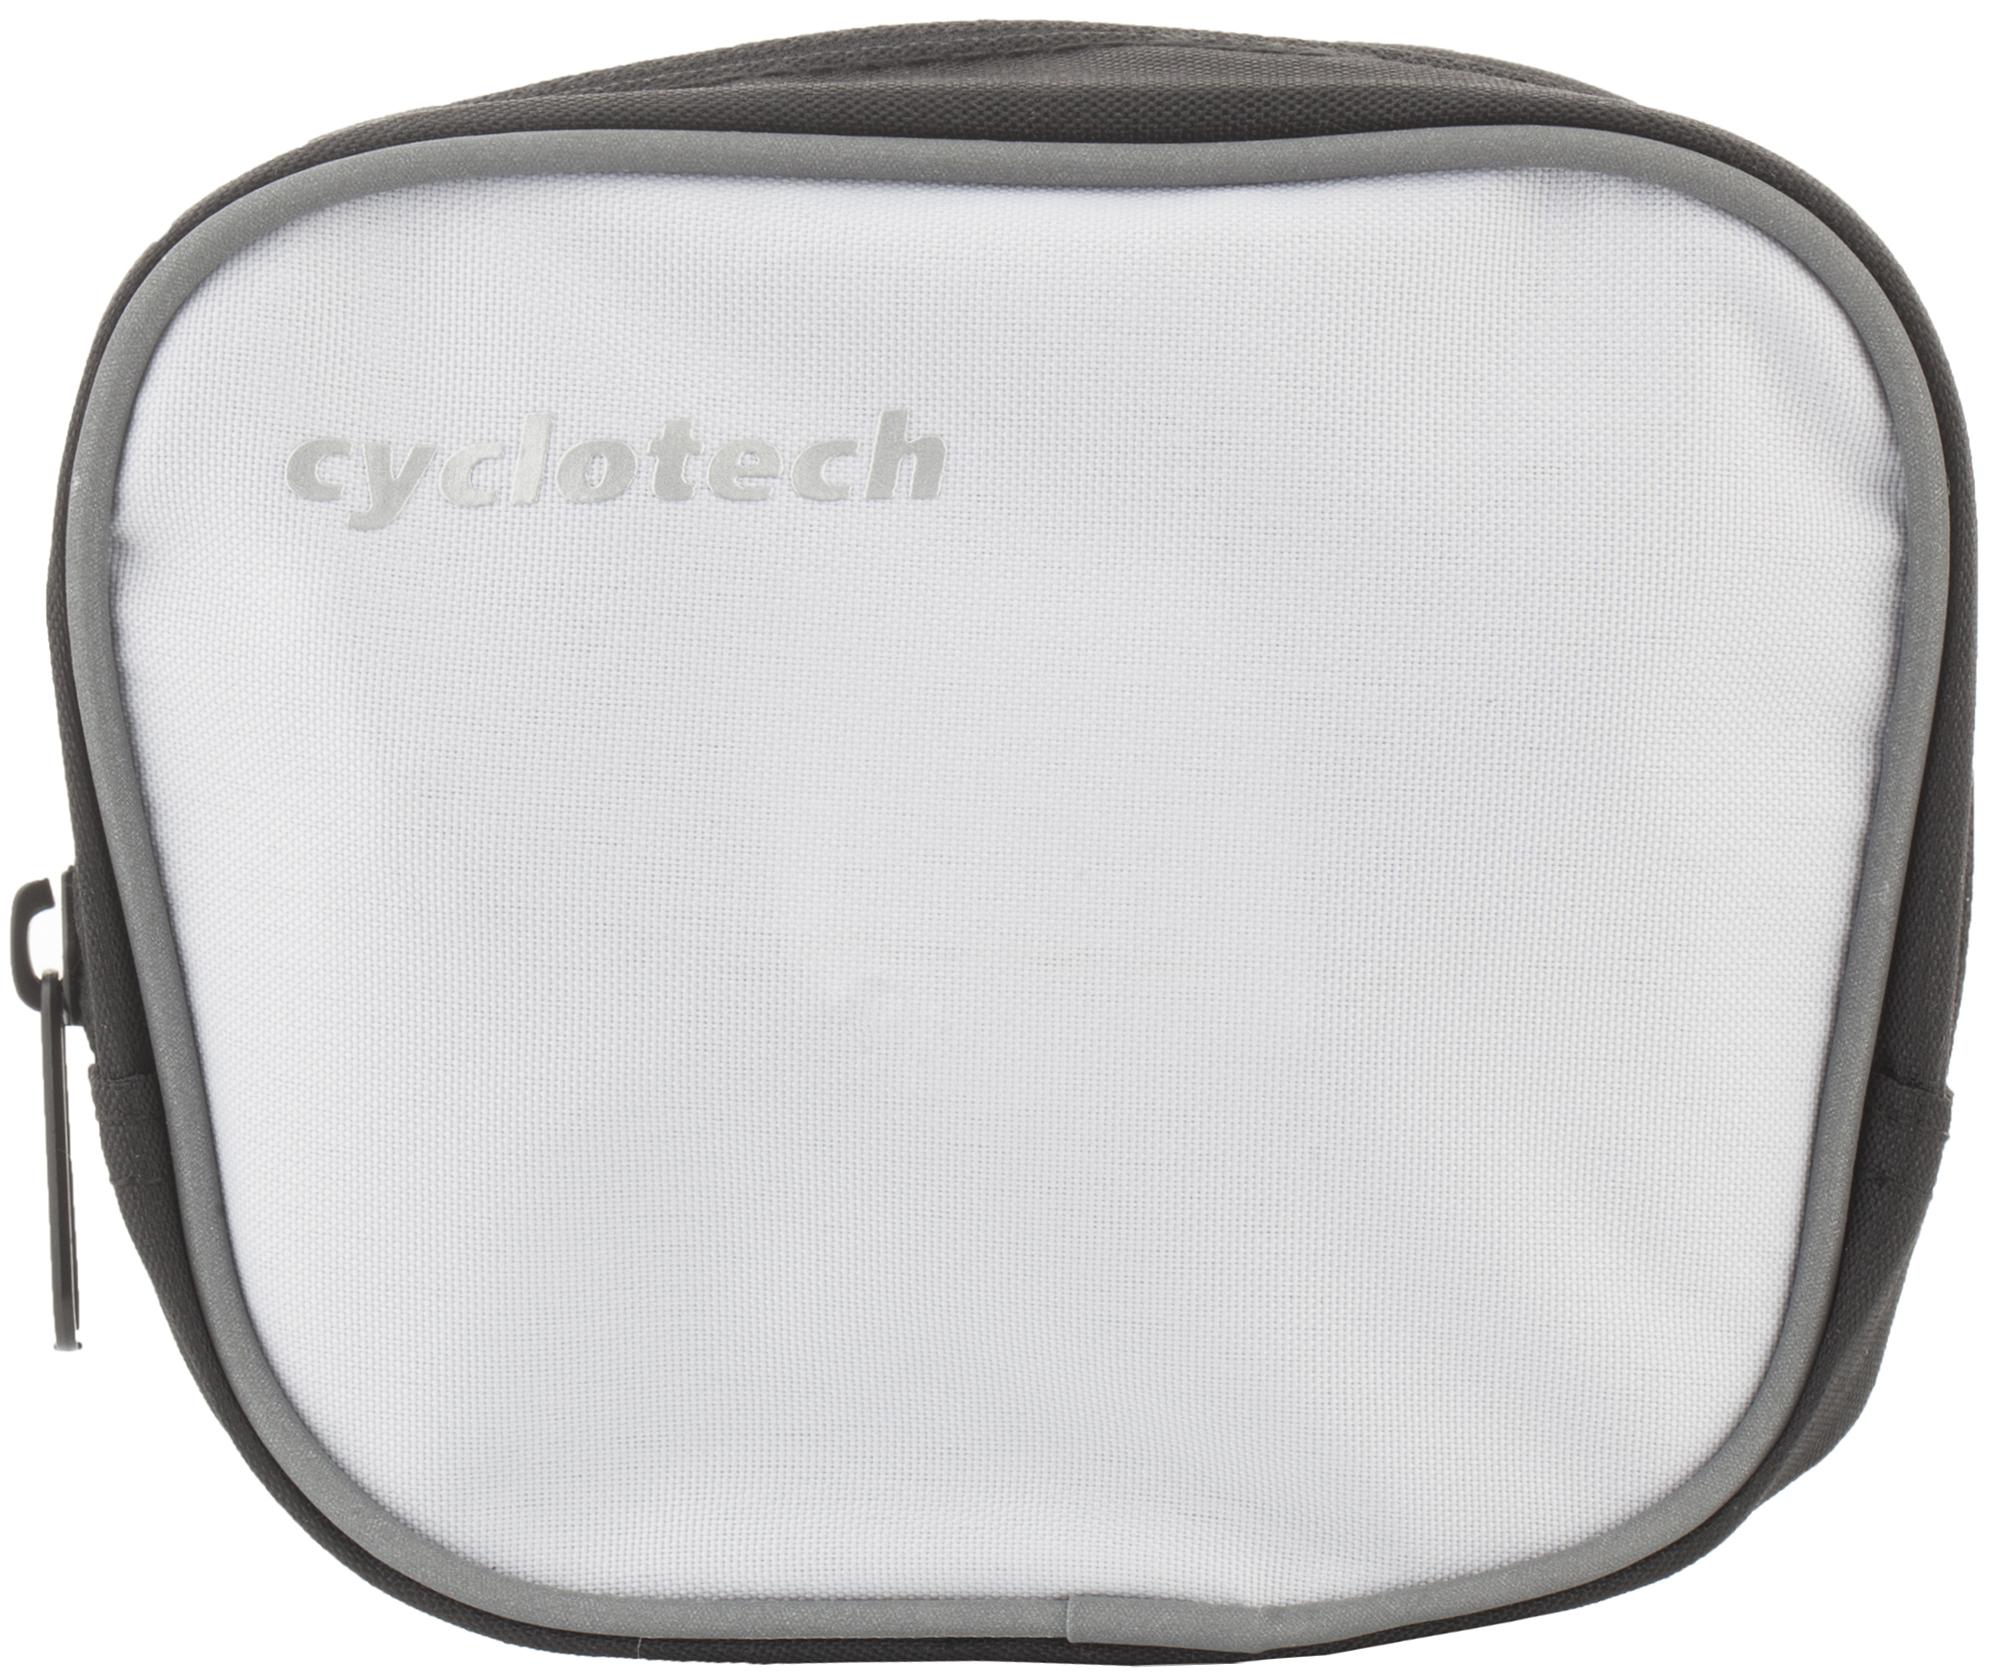 Cyclotech Сумка Cyclotech машинка для чистки цепи cyclotech cyclotech